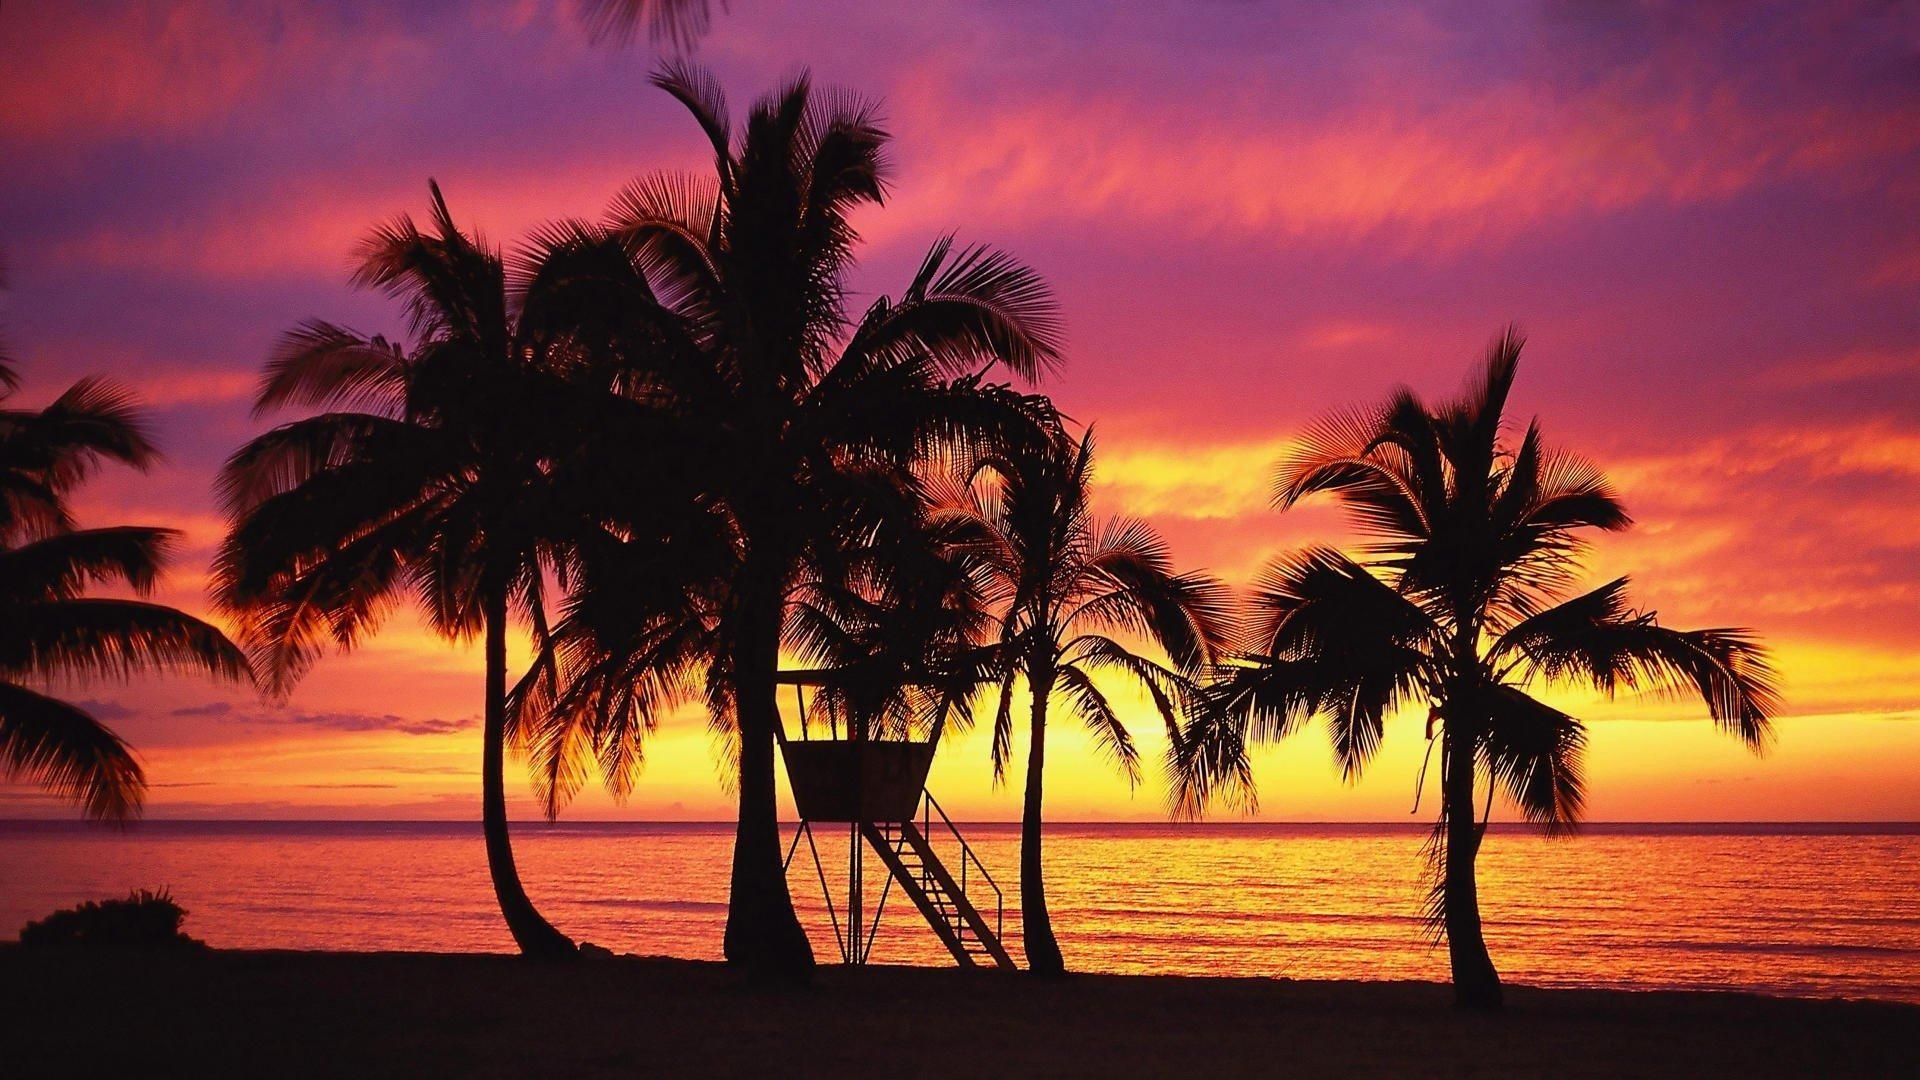 Wallpaper-hawaii-image-sunset-fresh-images-nature